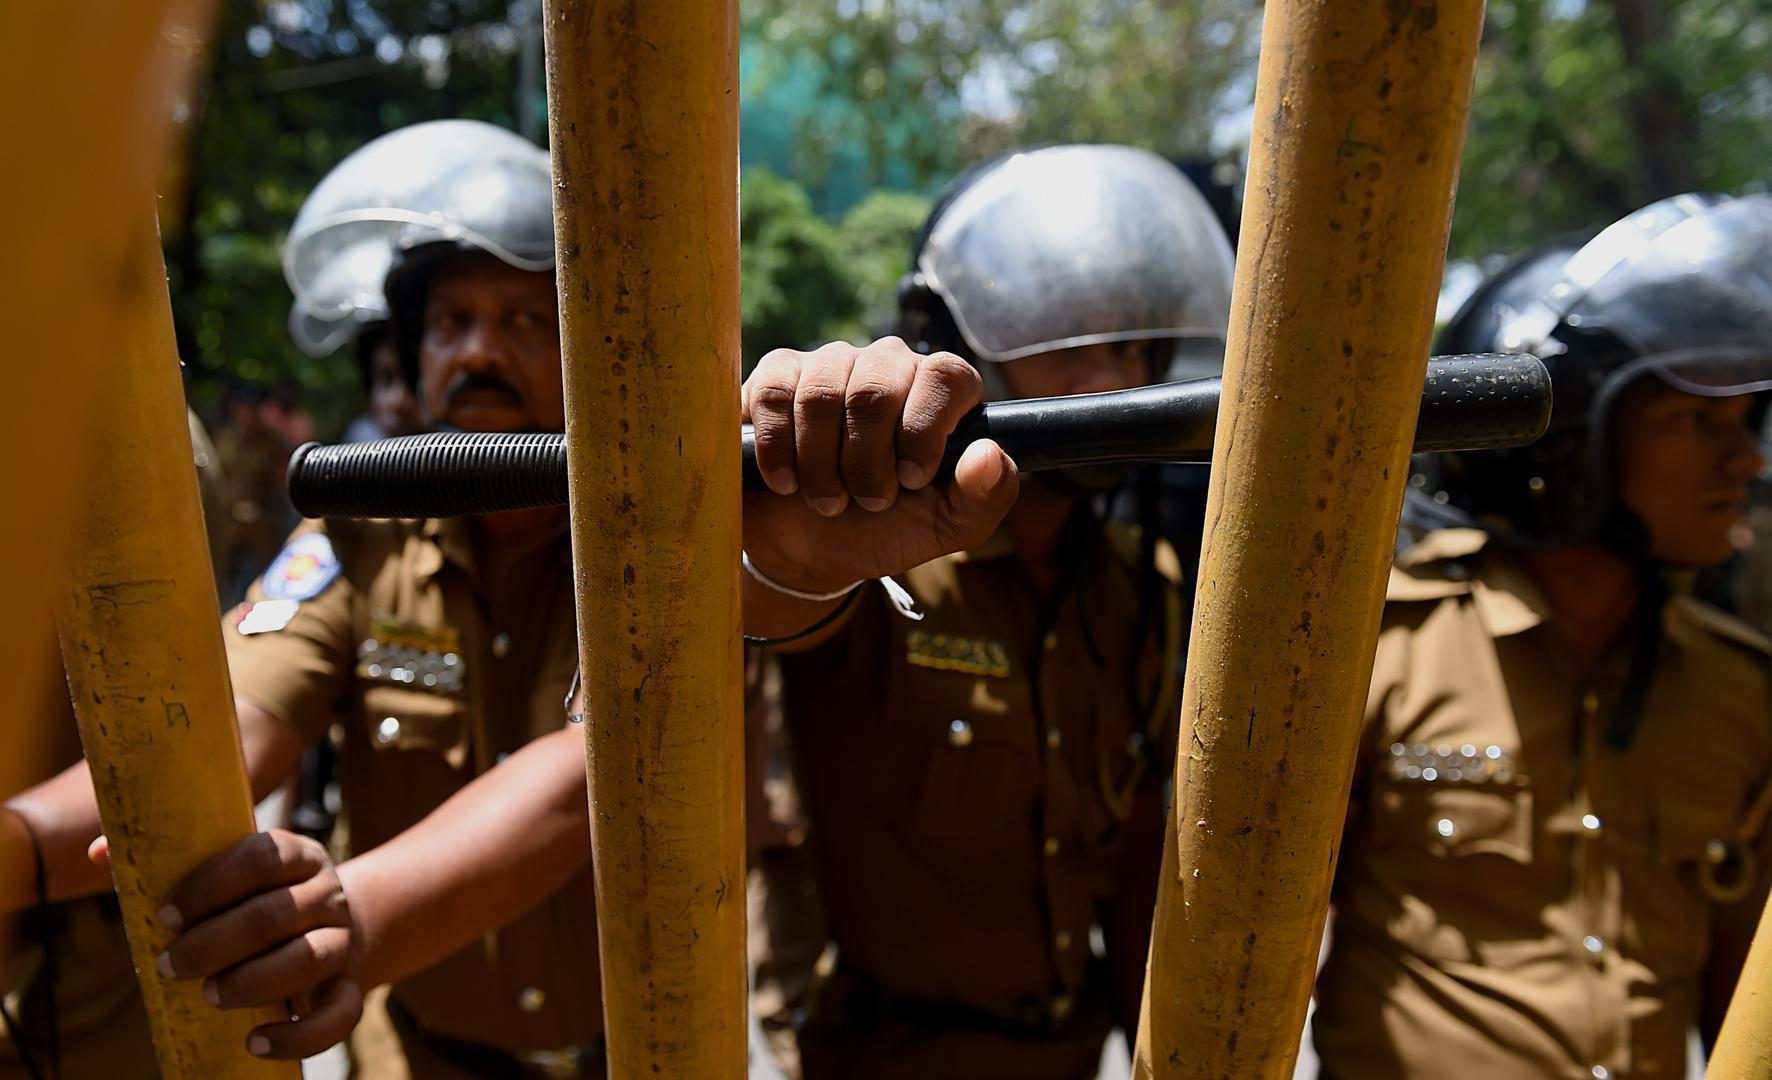 Polisi Sri Lanka berjaga dalam sebuah aksi unjuk rasa yang menyerukan pembebasan aktivis Tamil yang ditahan berdasarkan UU Pencegahan Terorisme di Kolombo, Sri Lanka, 14 Oktober 2015.